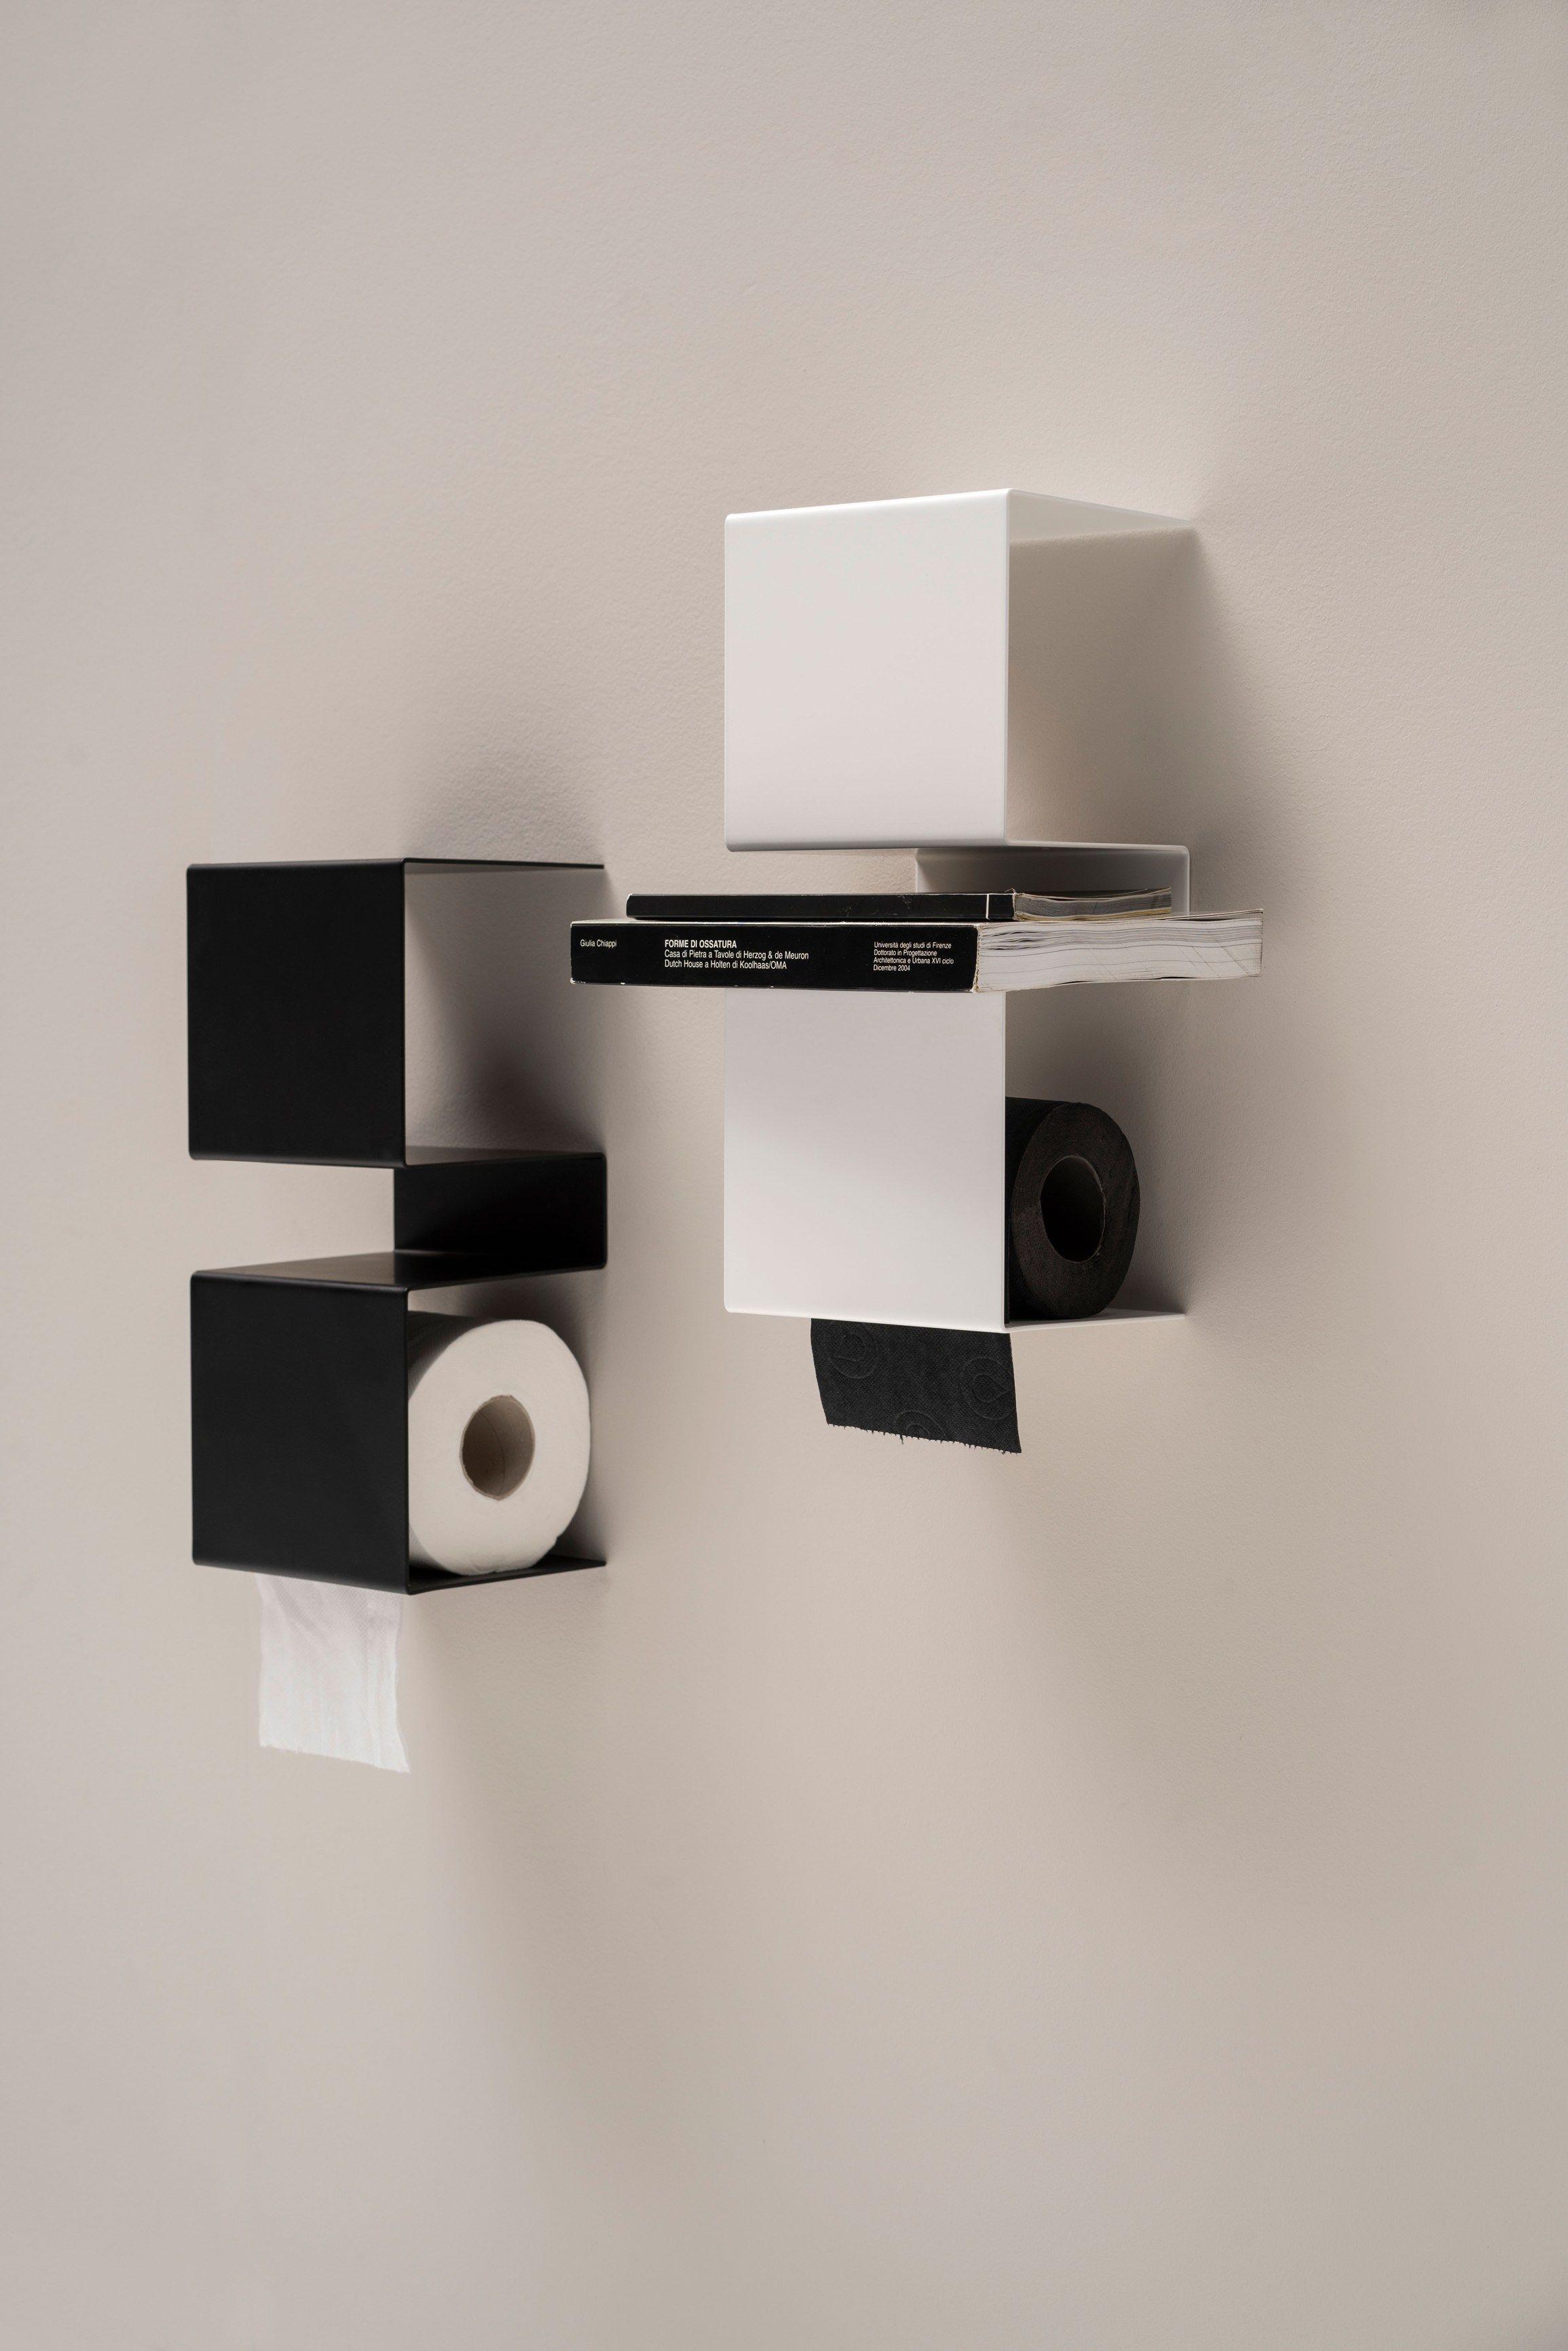 Perfect Stainless Steel Toilet Roll Holder INTEAM By Ex.t Design Ariane März